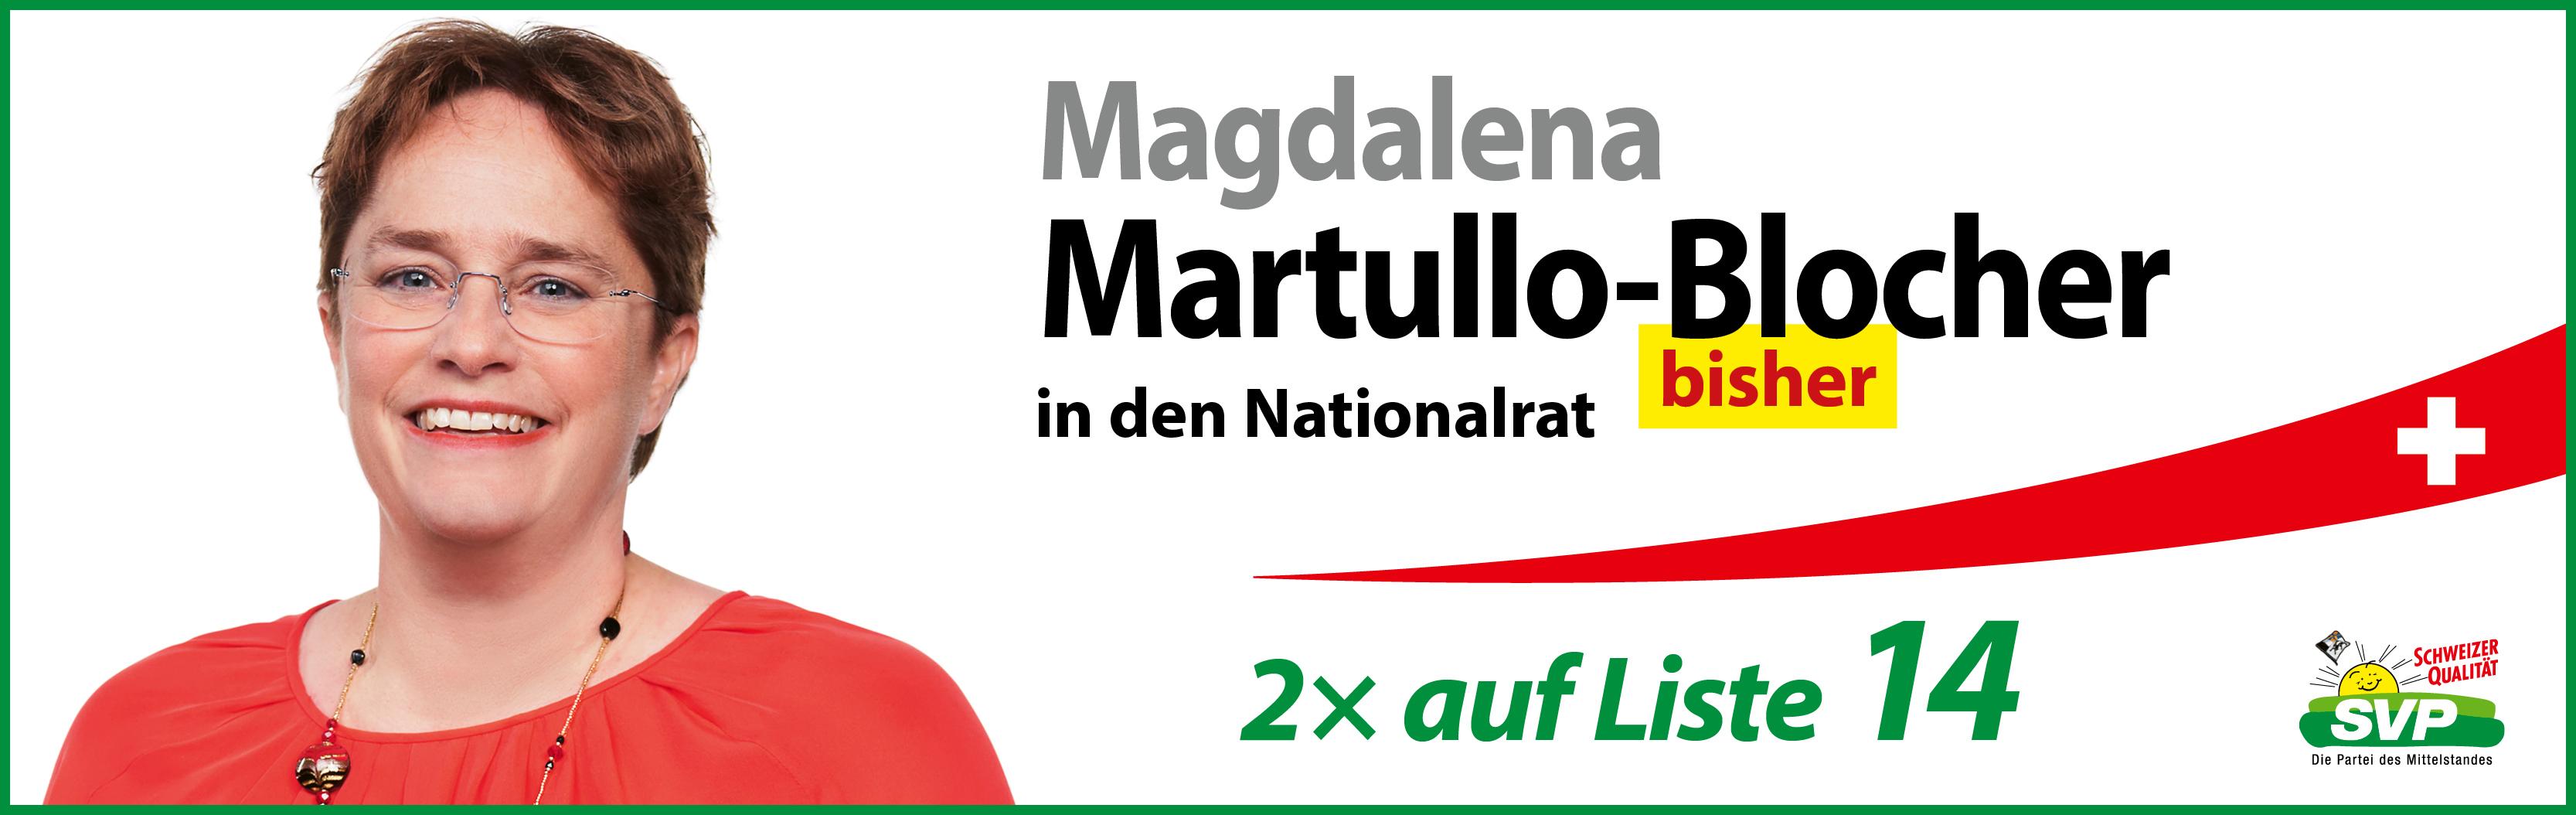 Magdalena Martullo-Blocher in Lenzerheide